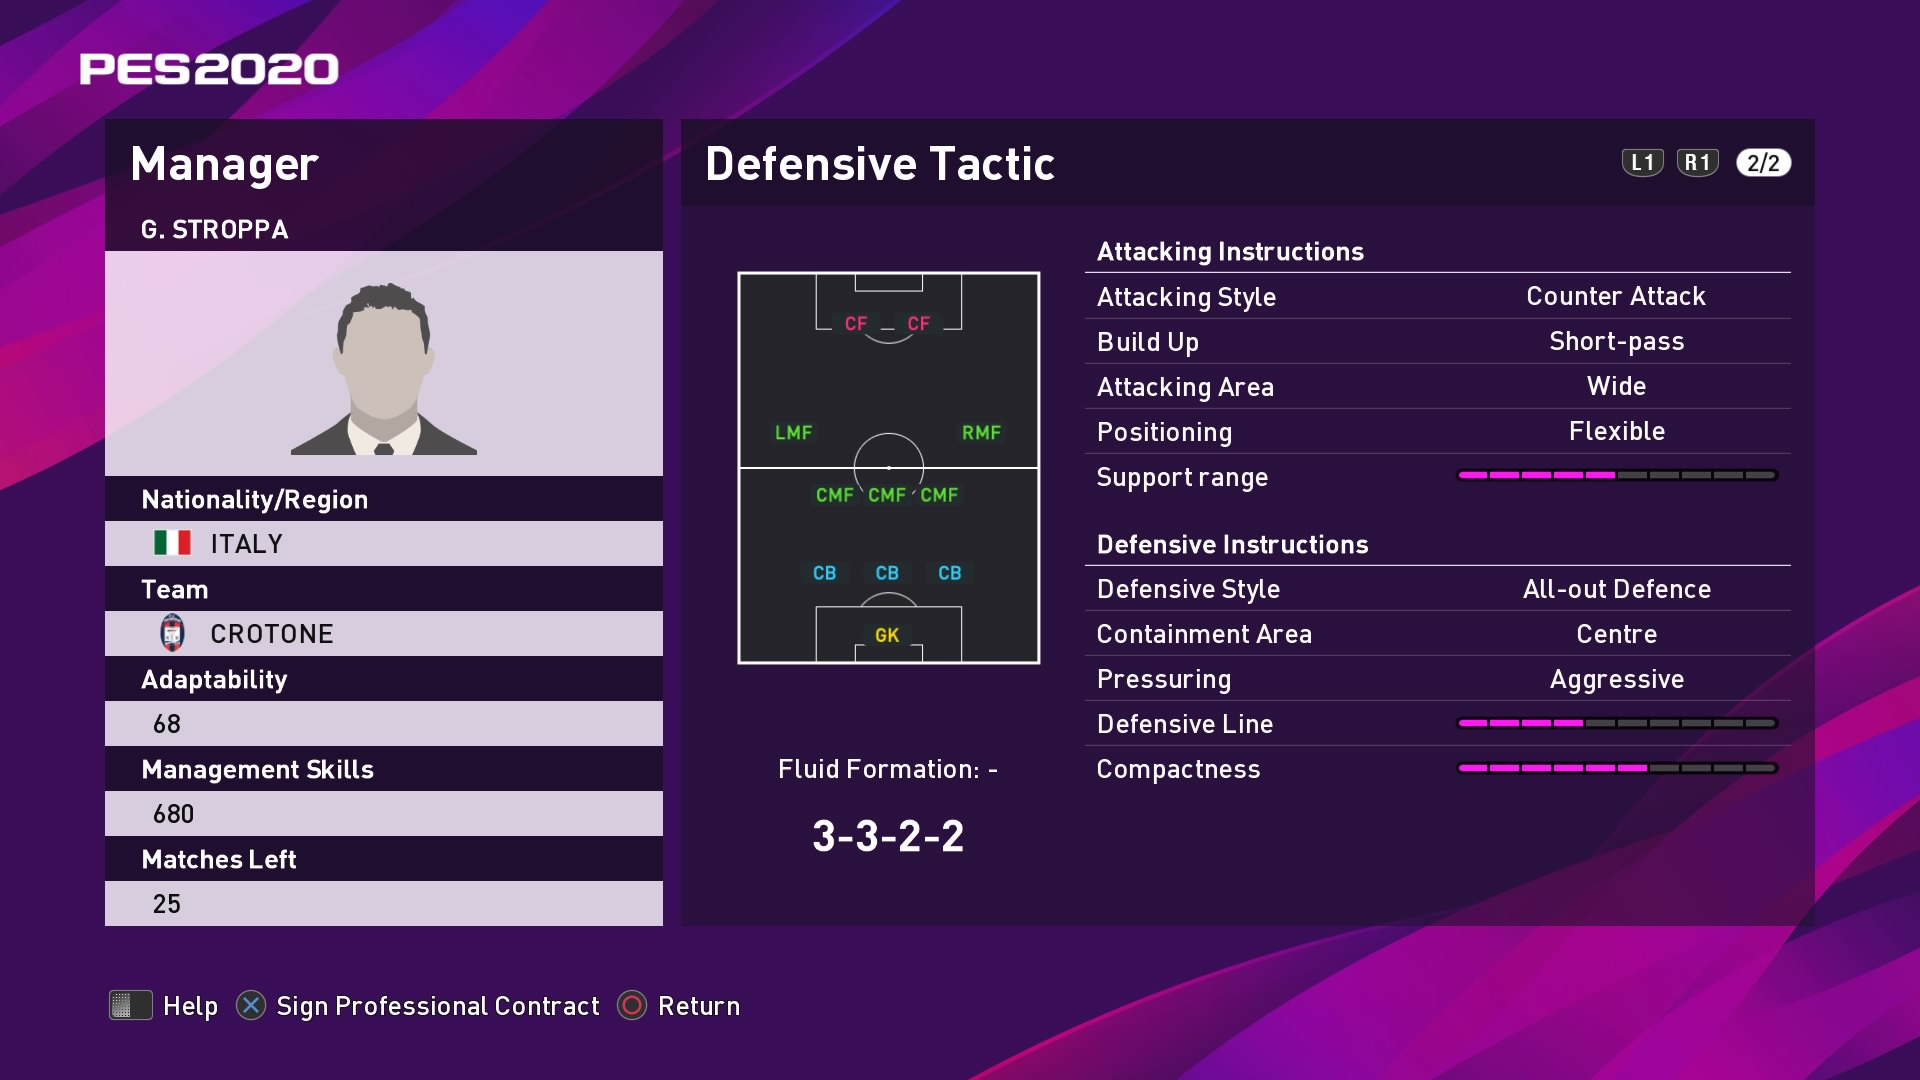 G. Stroppa (Giovanni Stroppa) Defensive Tactic in PES 2020 myClub